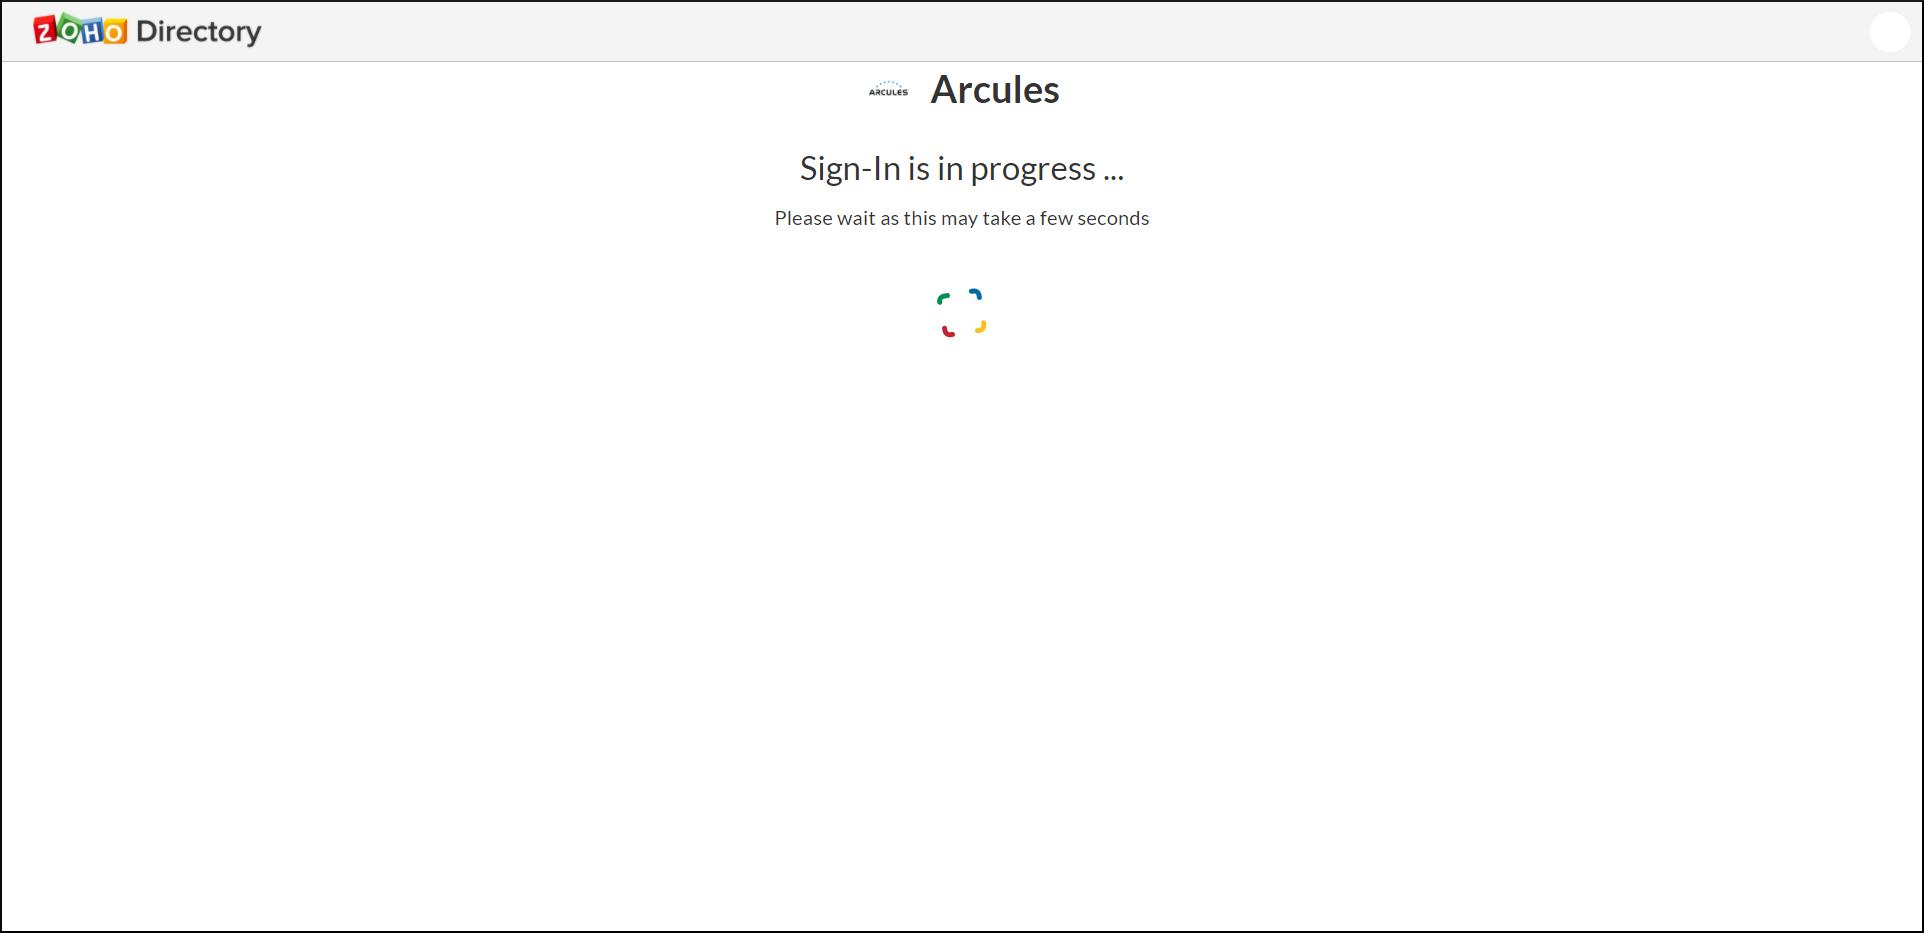 Testing SAML SSO for Arcules